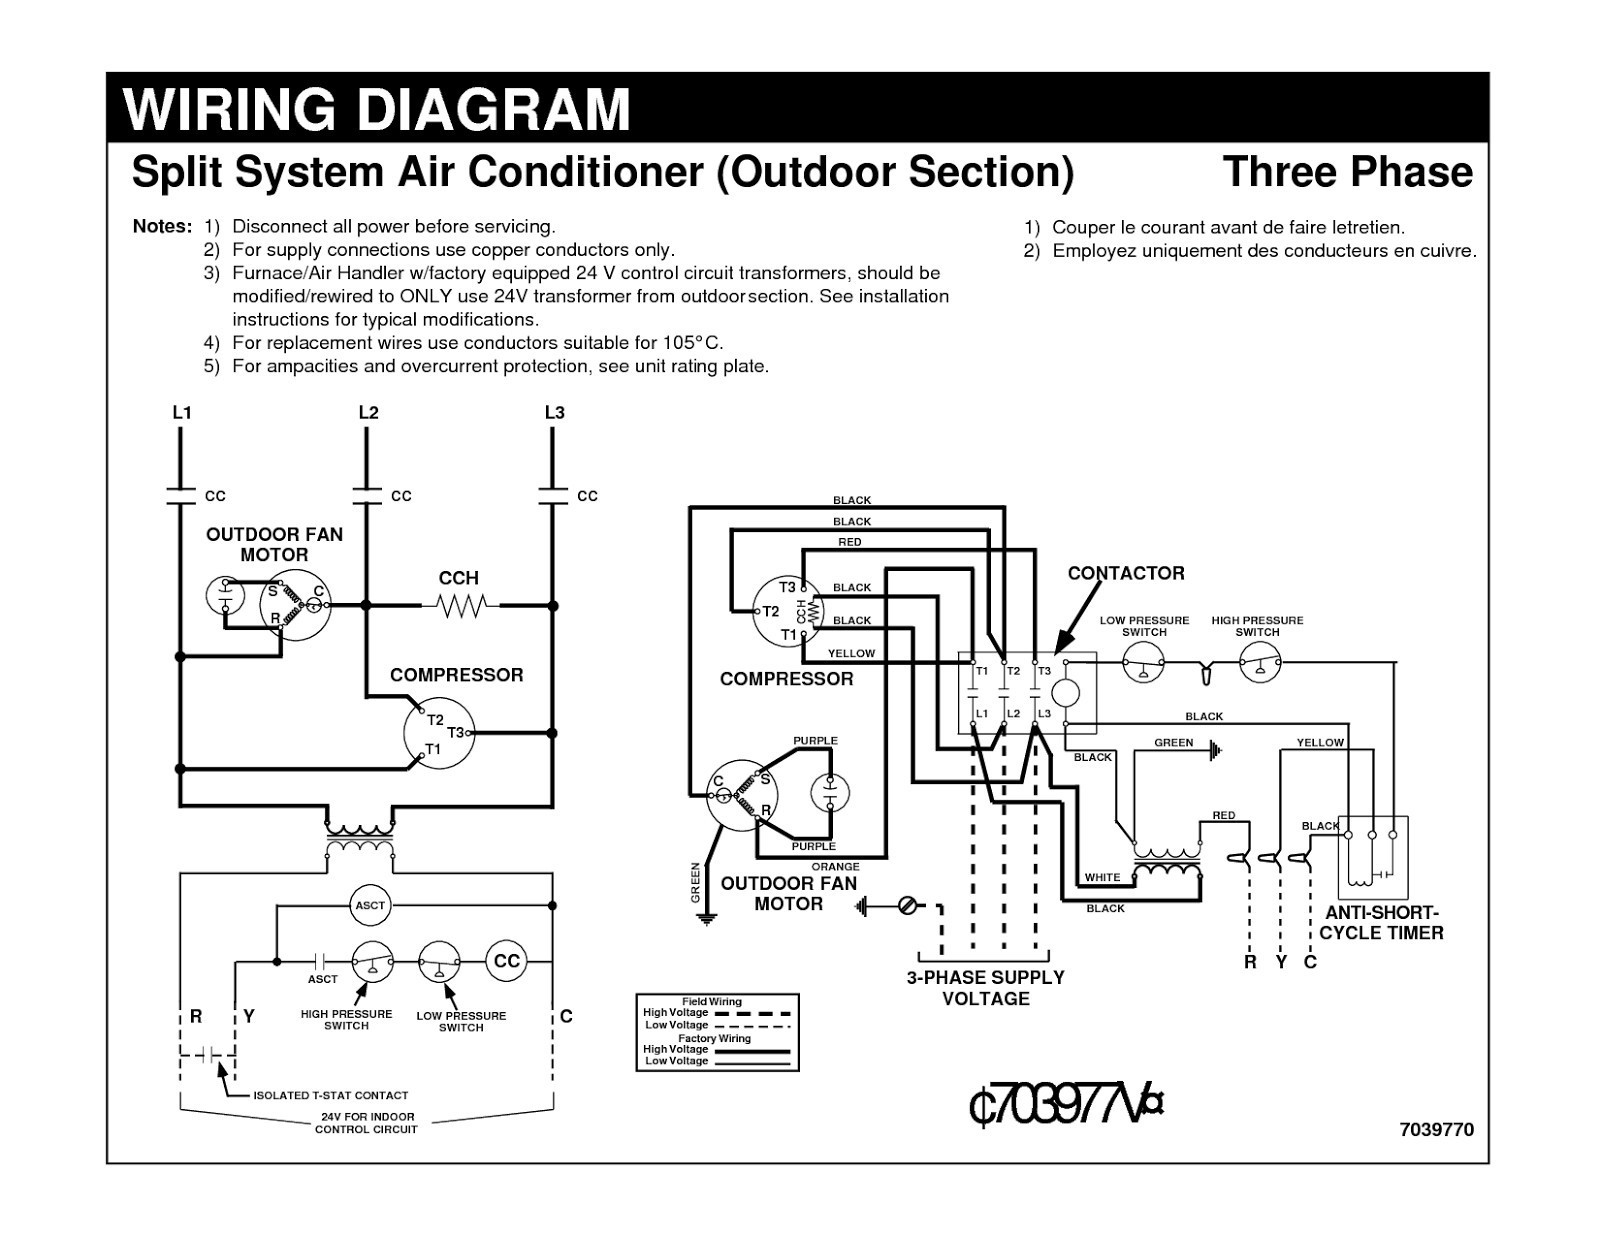 3 Phase Wiring Diagram House Elegant Best Passkey 3 Wiring Diagram - Passkey 3 Wiring Diagram